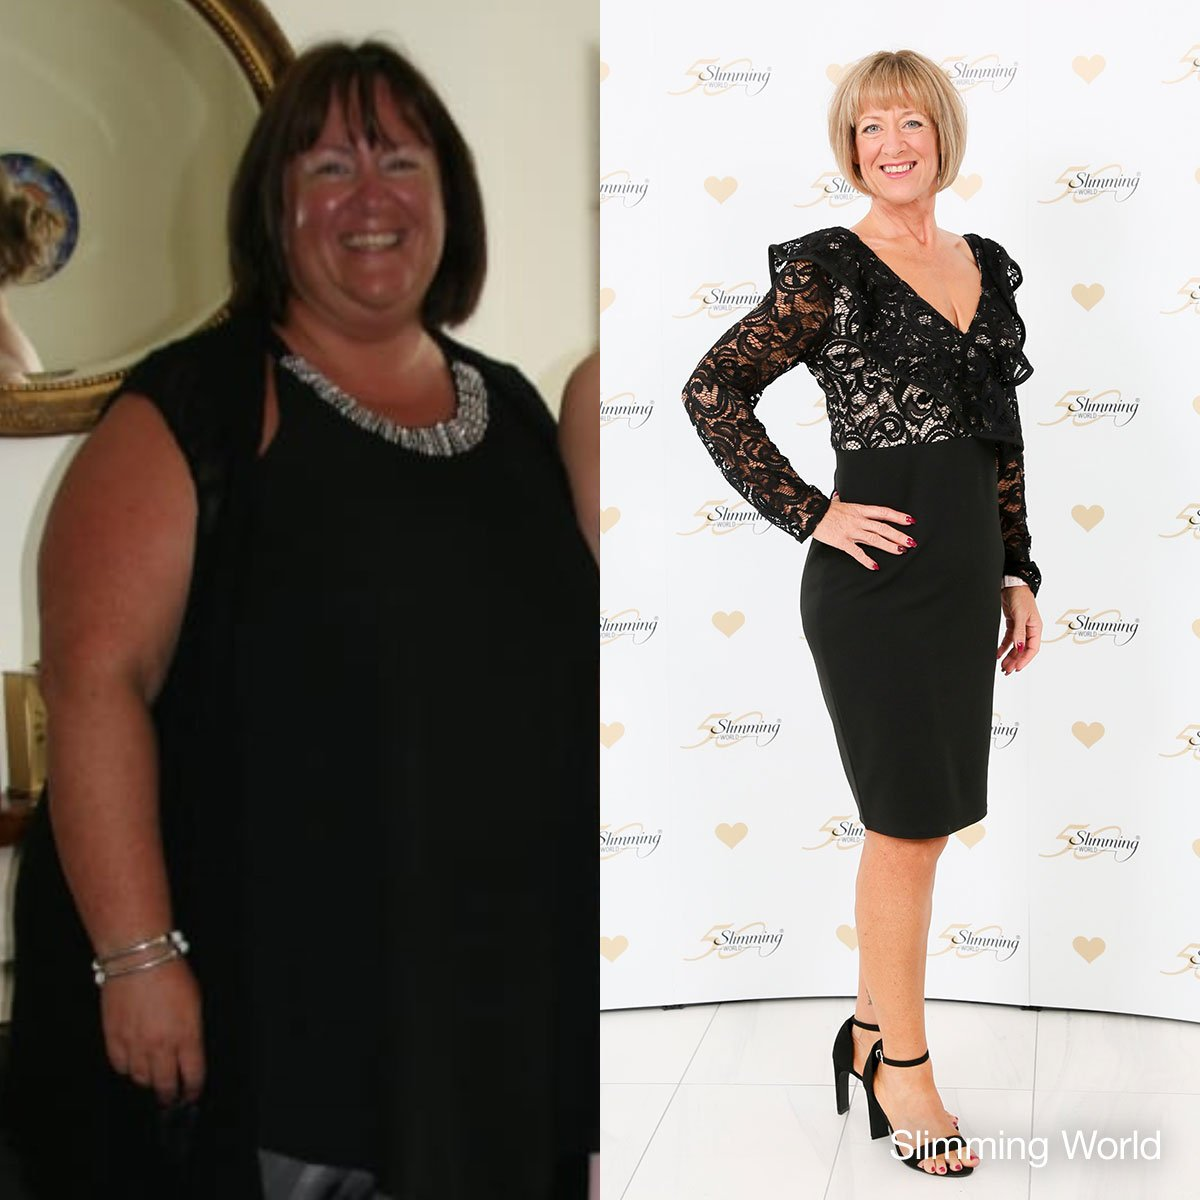 @SlimmingWorld's photo on #TransformationTuesday